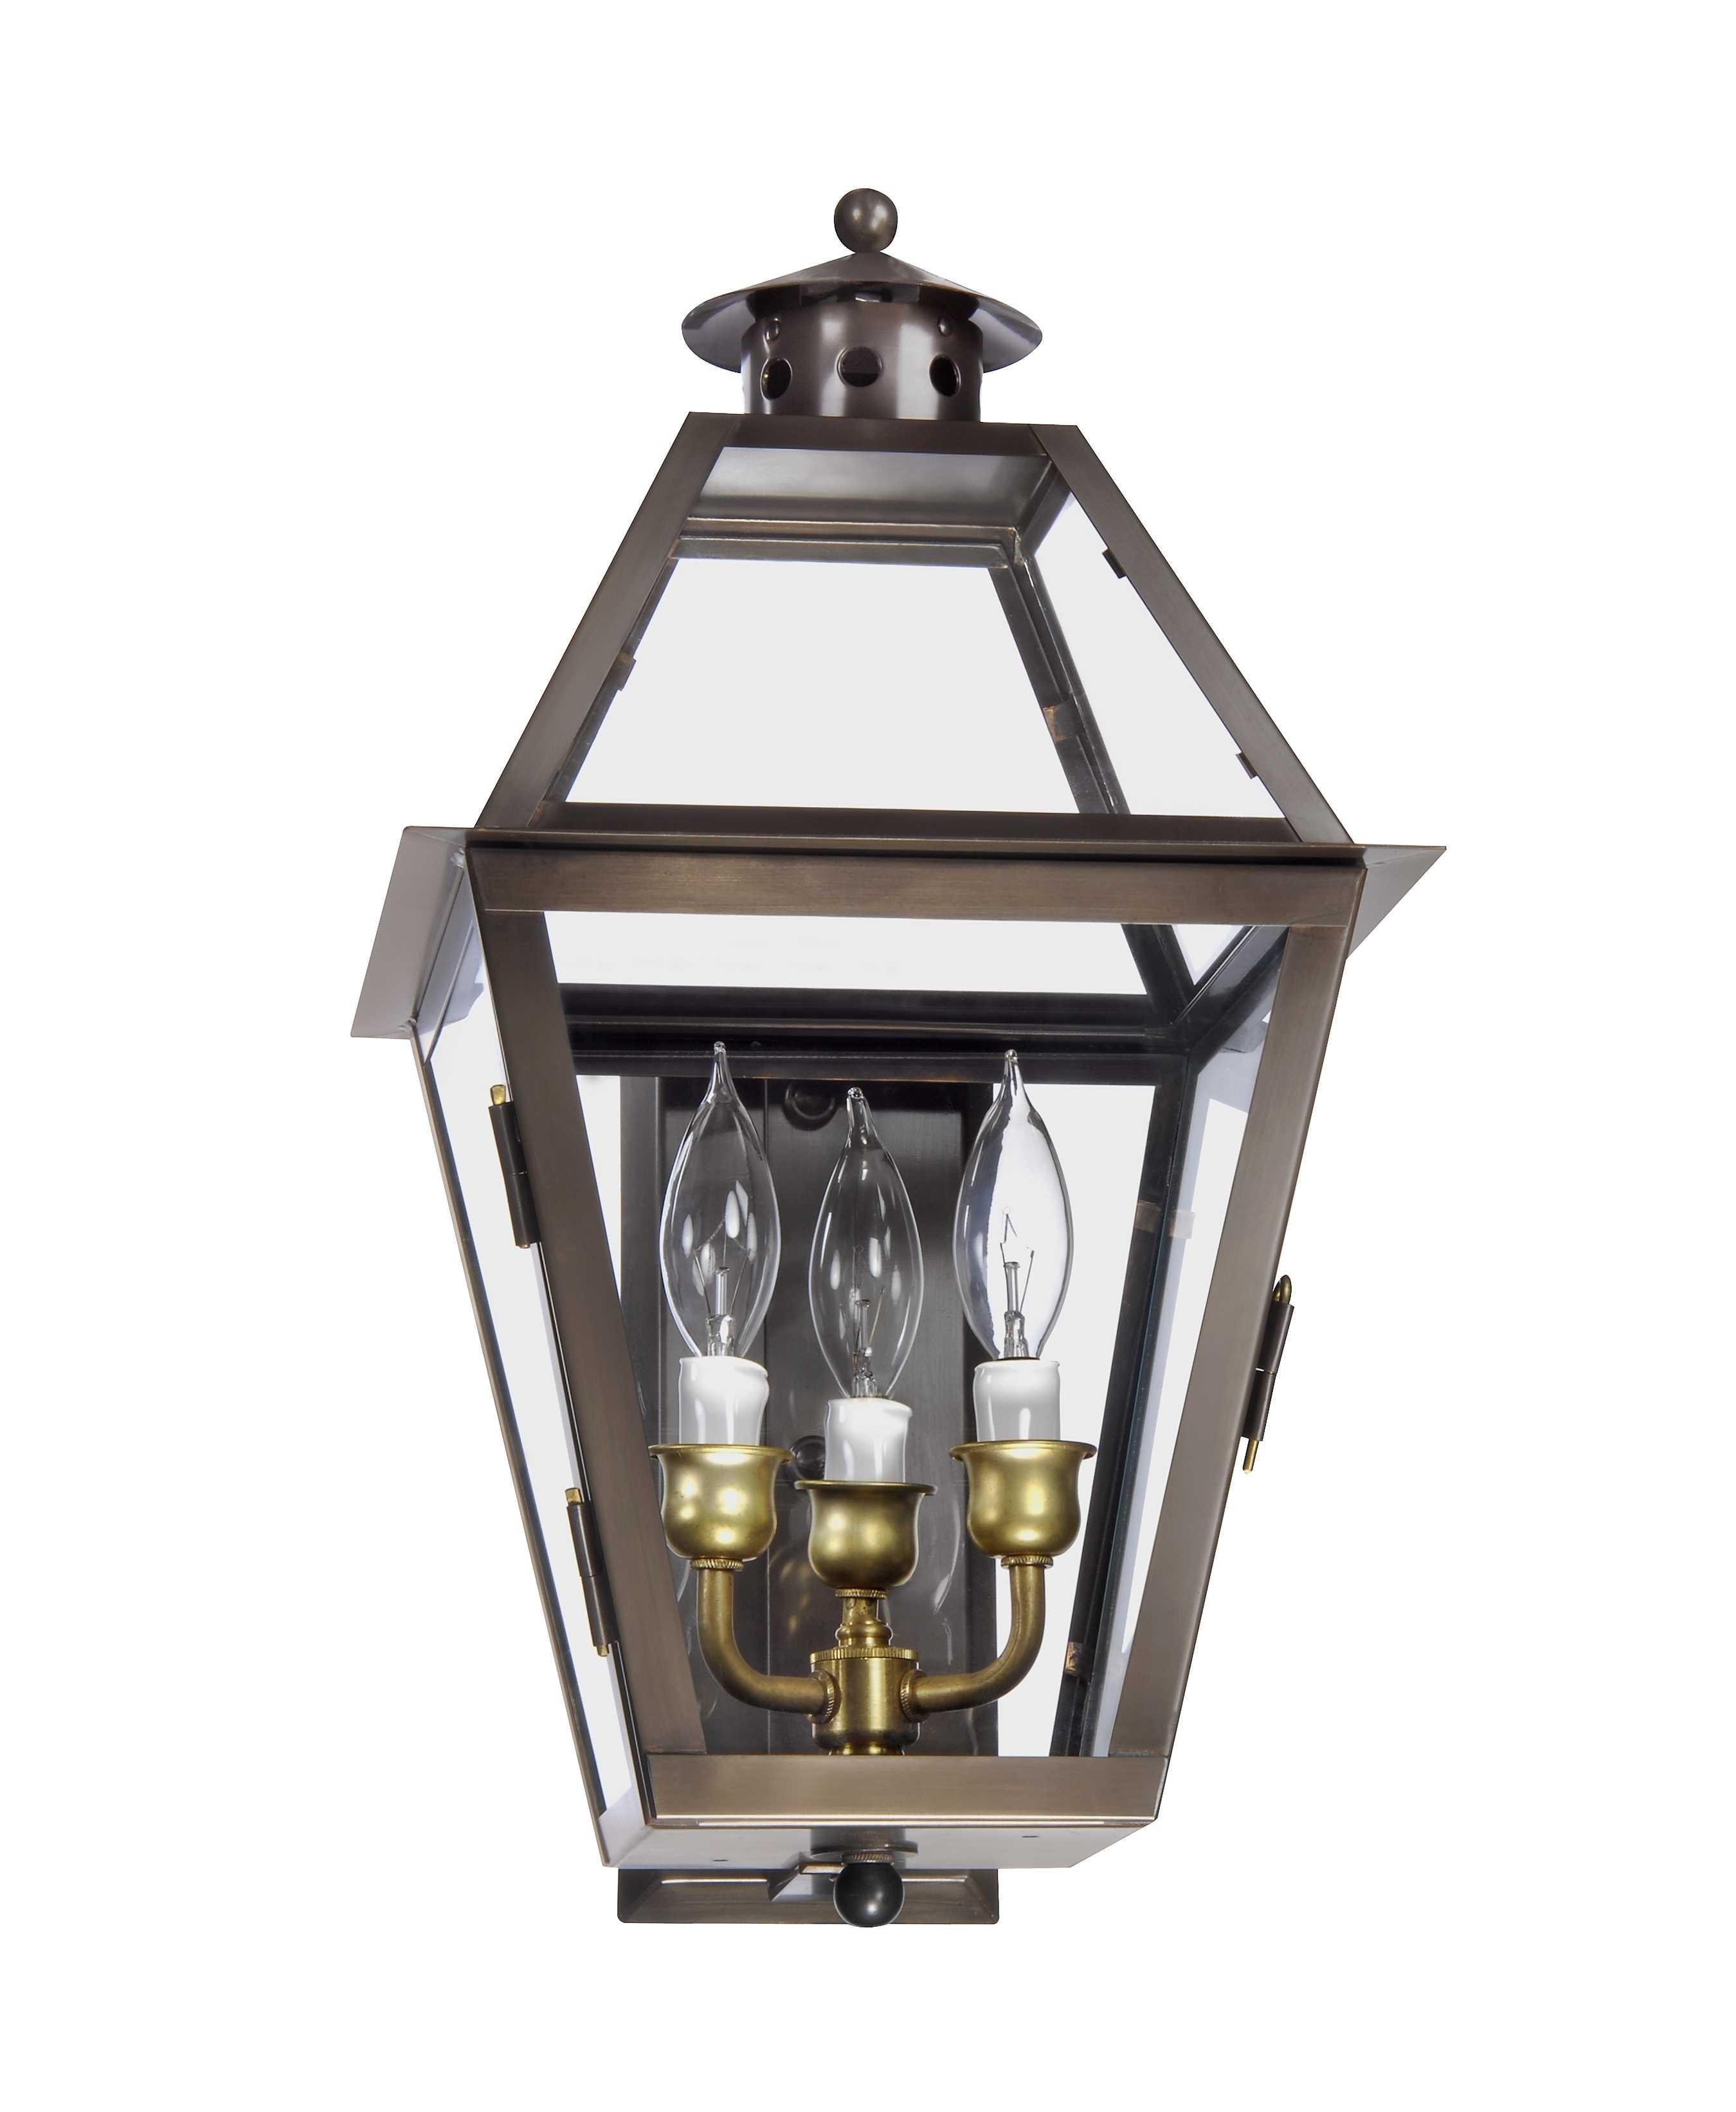 Outdoor Lanterns   Copper Exterior Lighting - Lantern & Scroll with Outdoor Exterior Lanterns (Image 16 of 20)